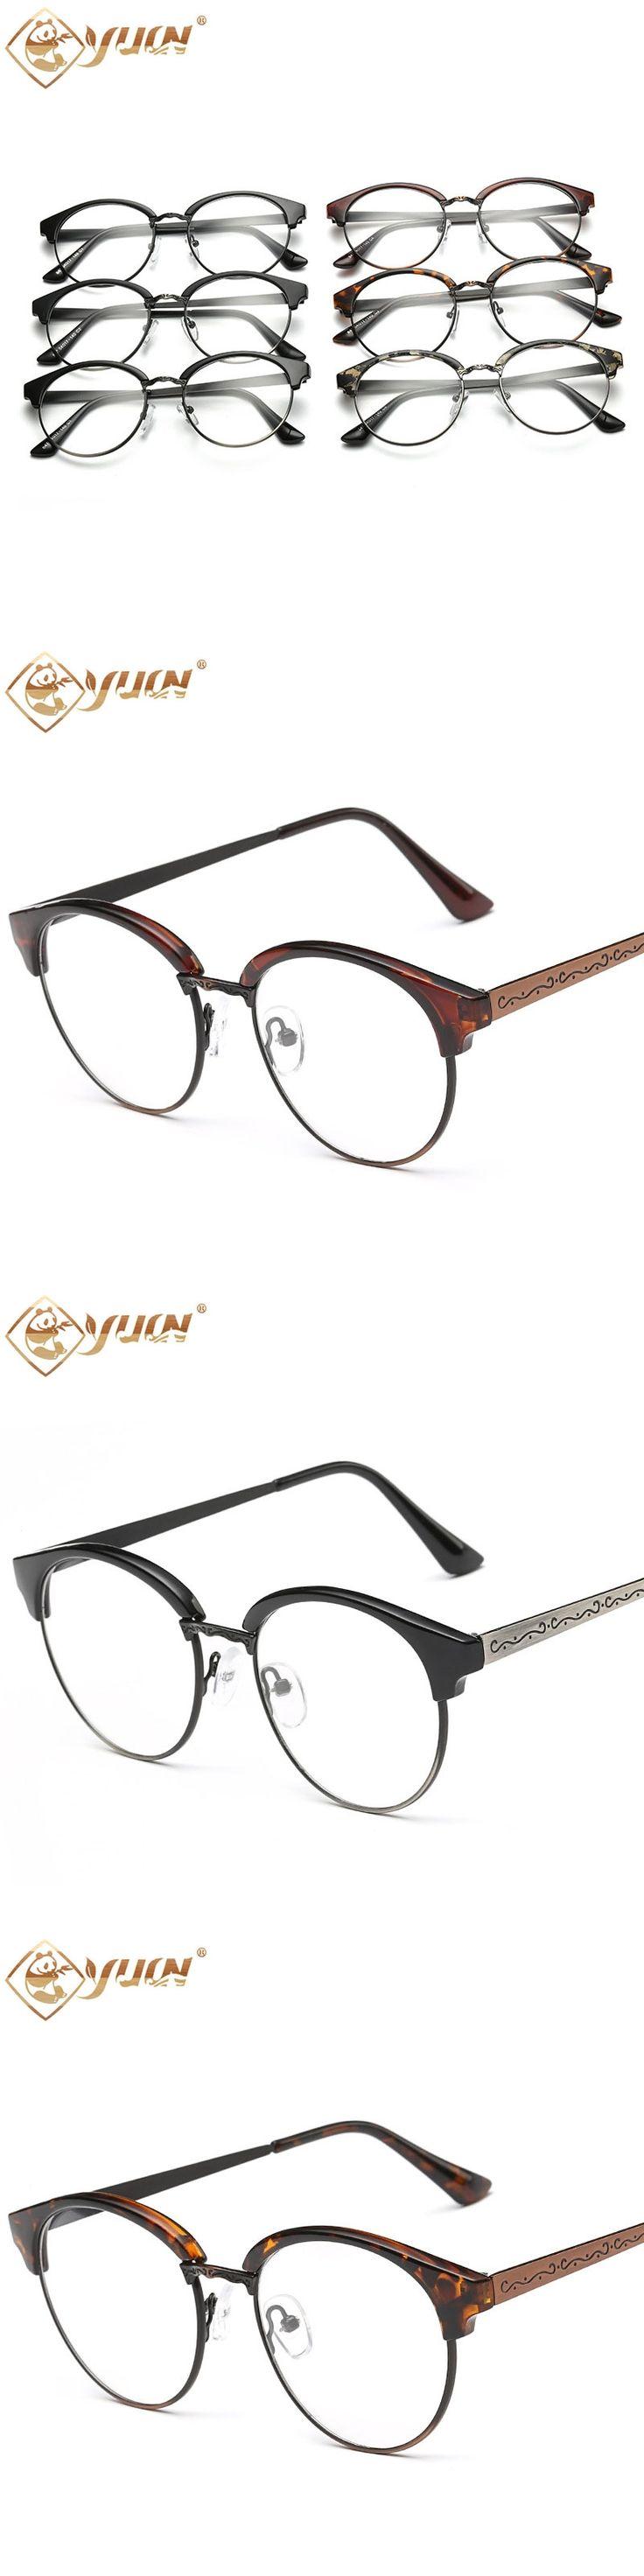 YUW vintage glasses round prescription eyeglass frames optical men women oculos clear glasses 847